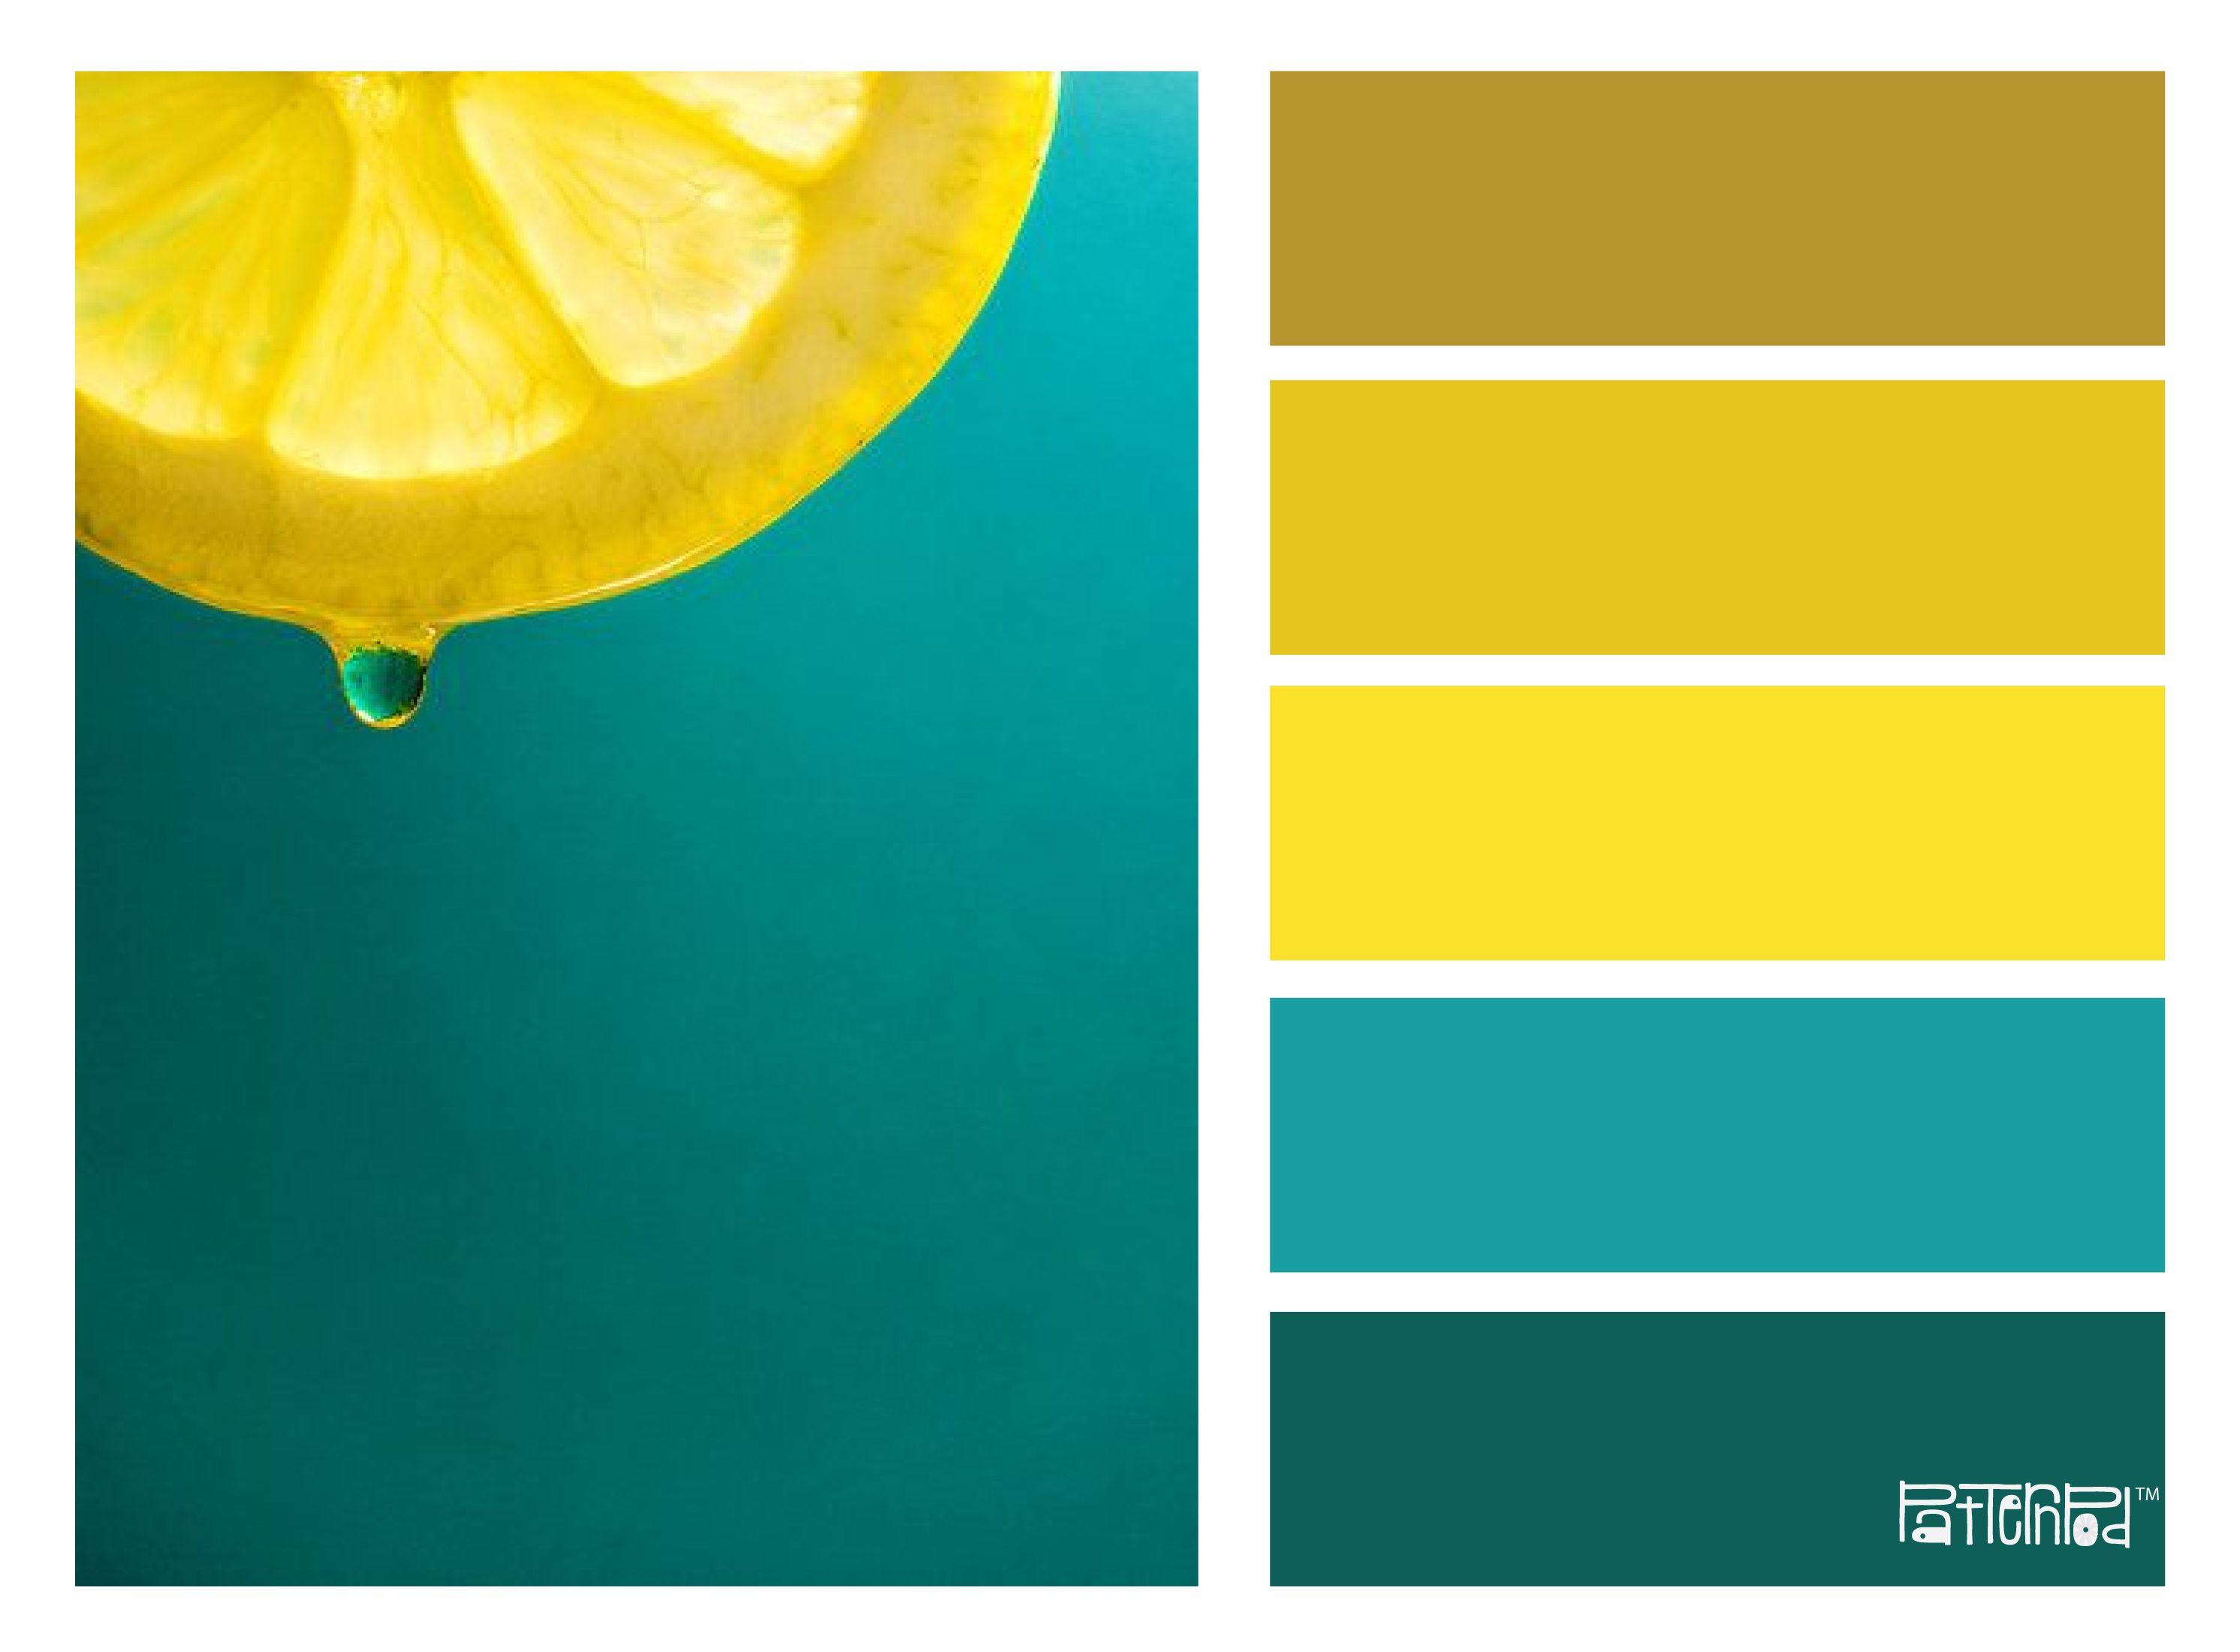 Pin by Lori Shulik on Scrapbooking: | Pinterest | Lemon, Color ...